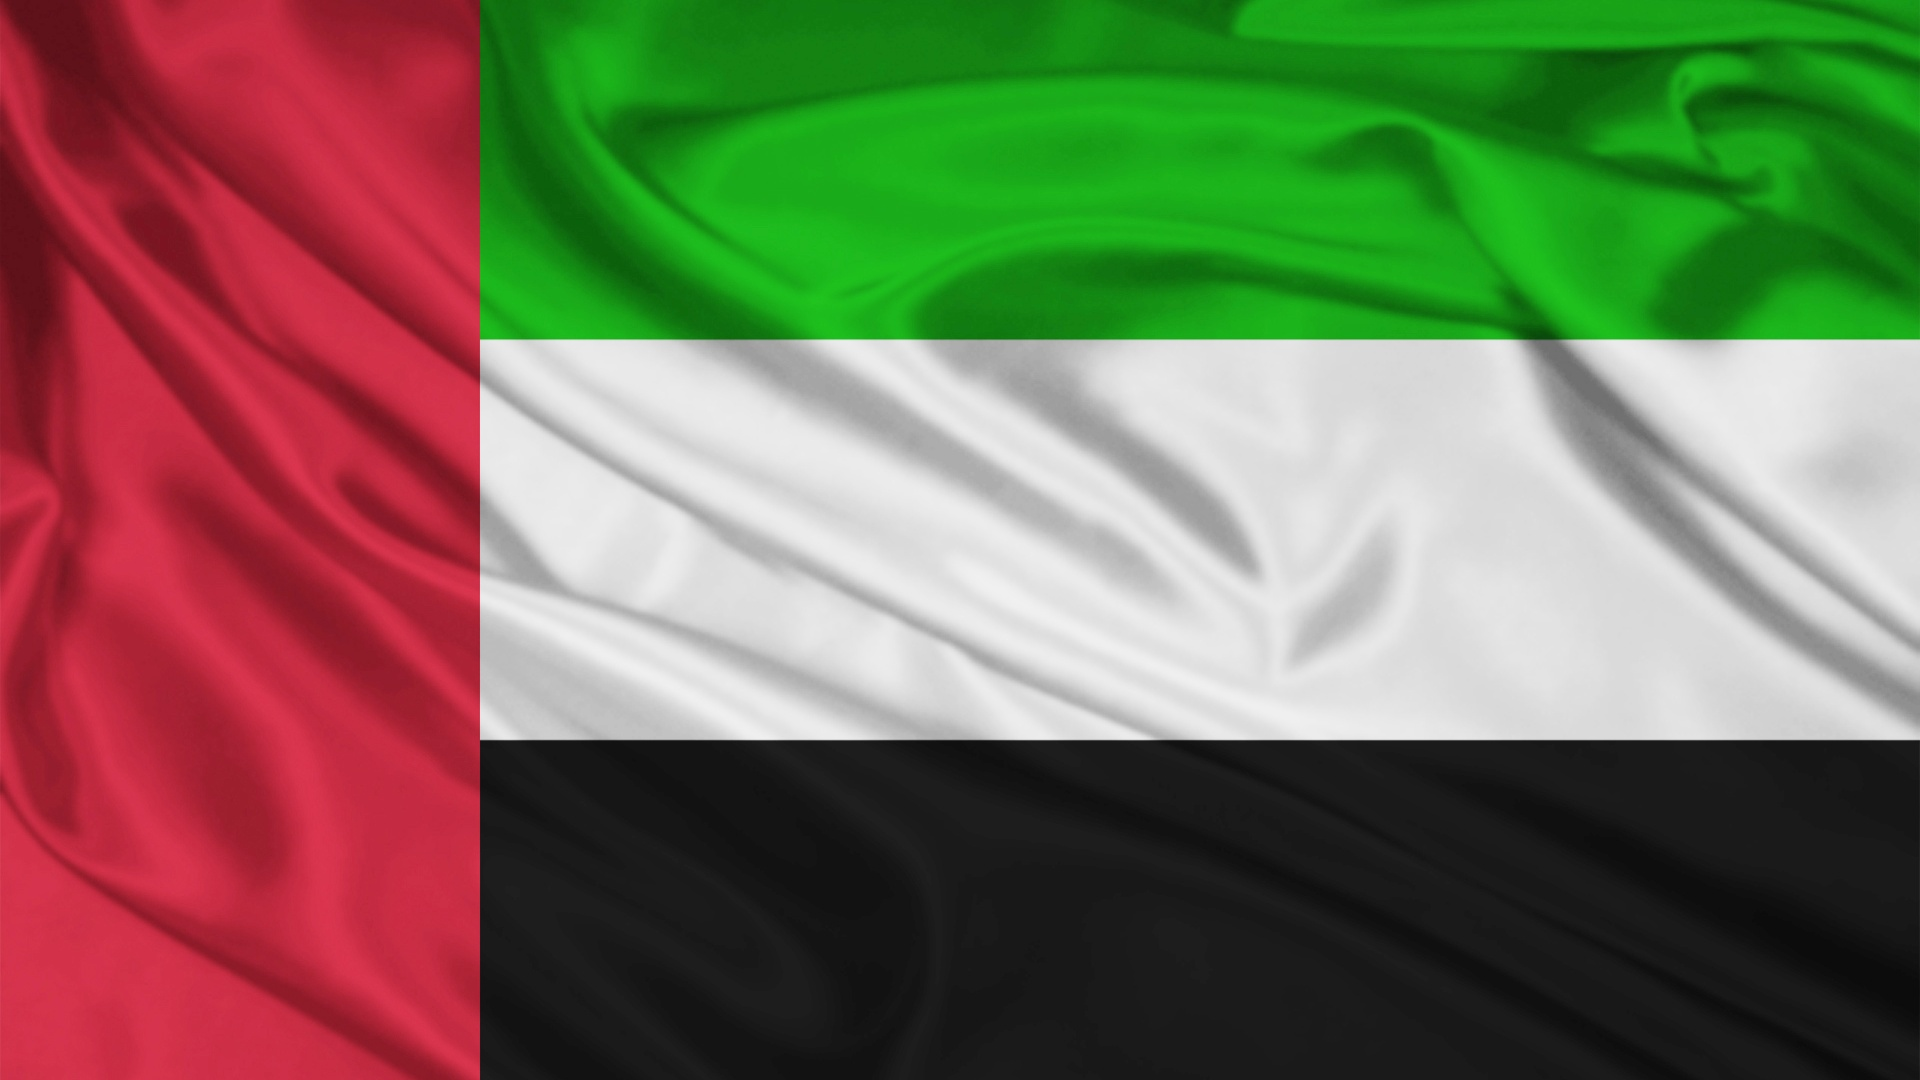 1920x1080 United Arab Emirates Flag desktop PC and Mac wallpaper 1920x1080